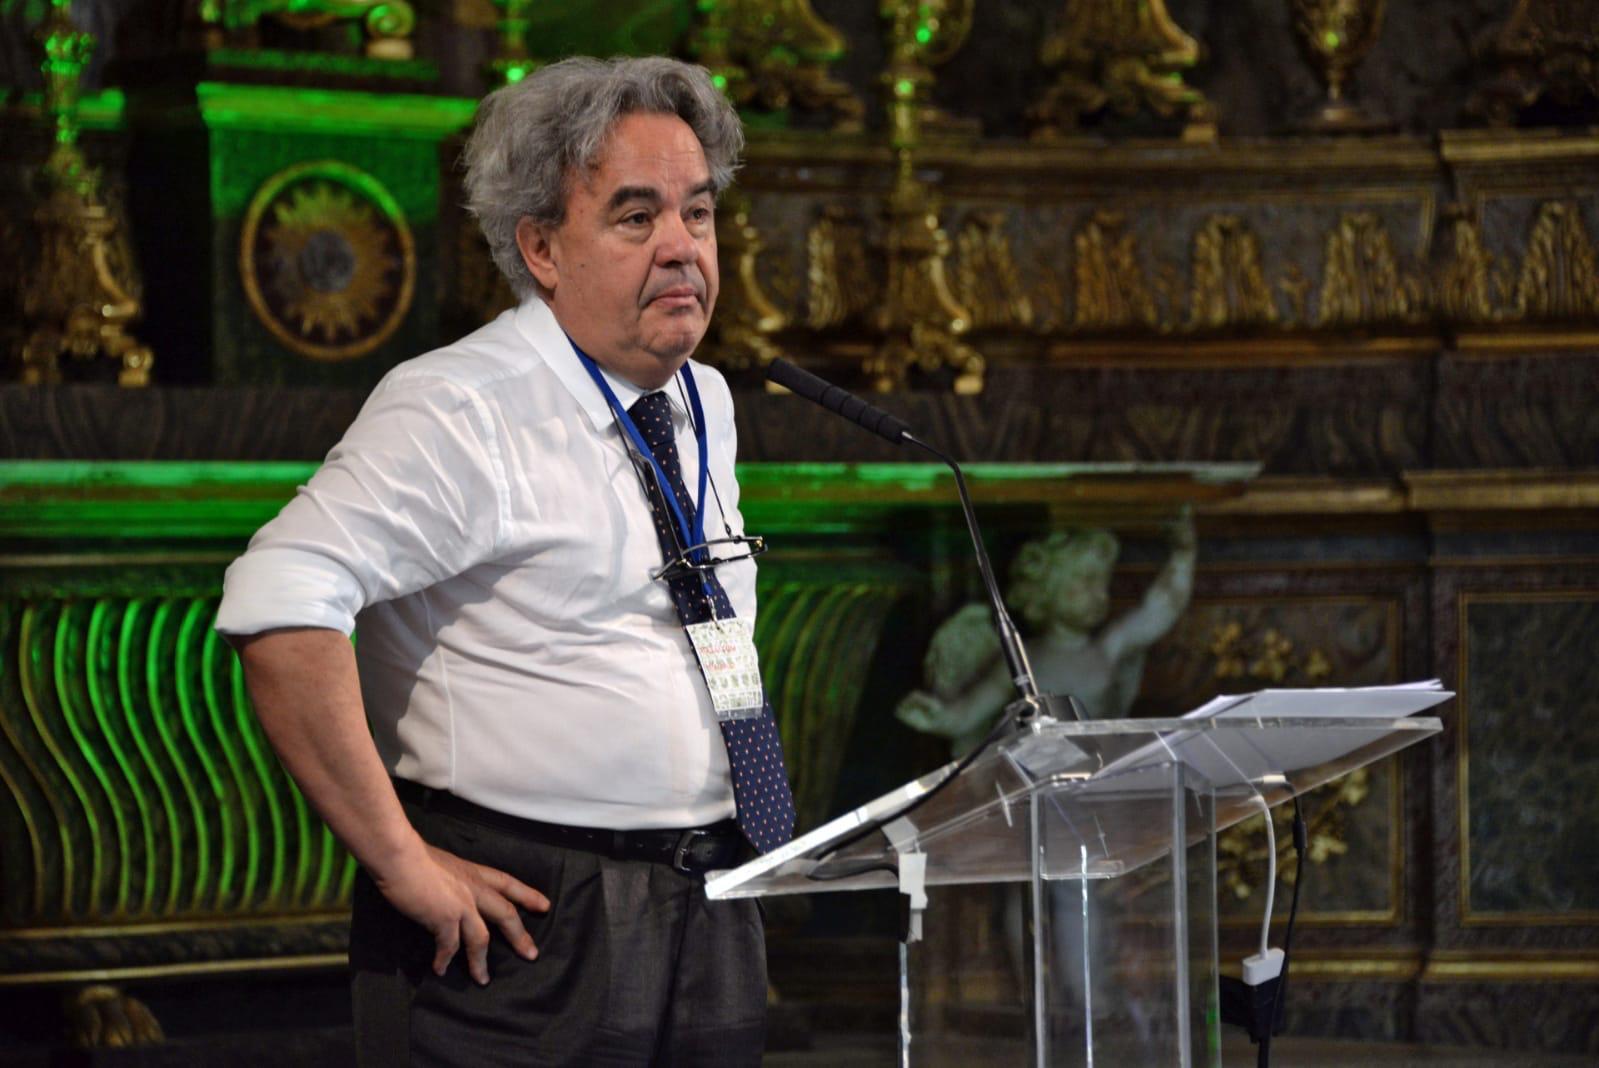 Mauro Felicori, credits Angelo Marra